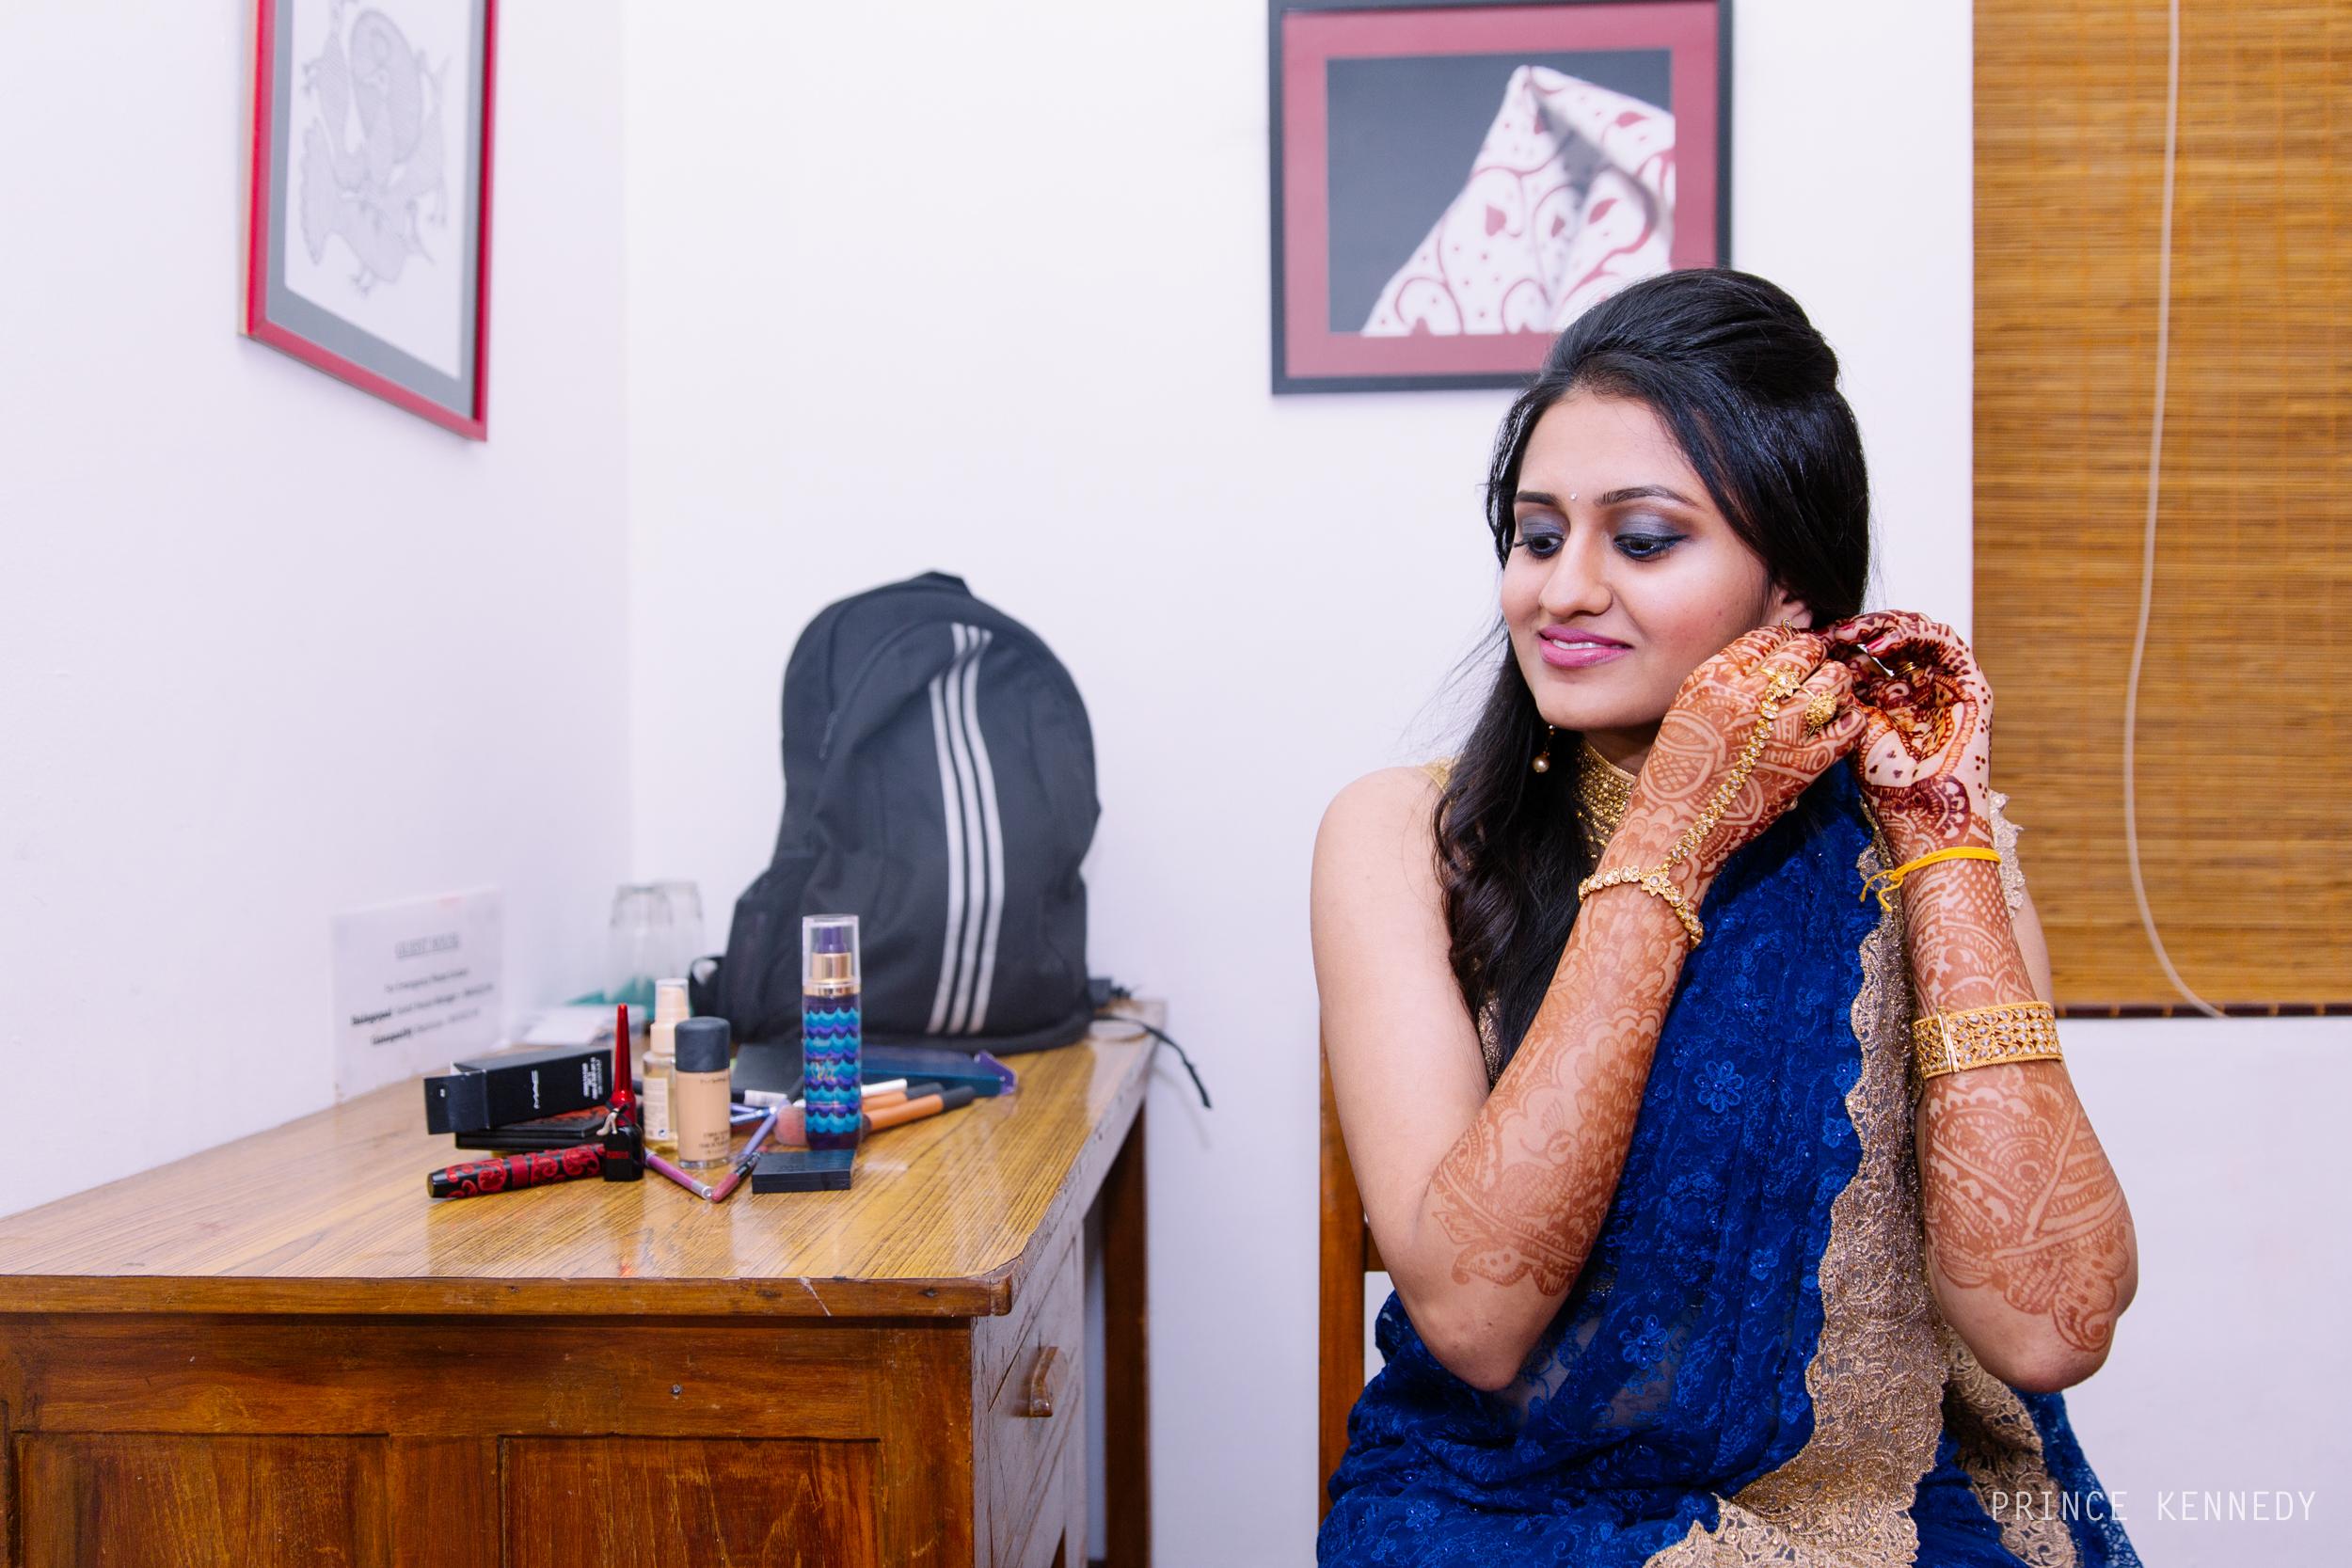 Athmajja-Nithesh-Engagement-Couple-Portrait-Portraiture-Wedding-Couple-Portrait-Chennai-Photographer-Candid-Photography-Destination-Best-Prince-Kennedy-Photography-35.jpg